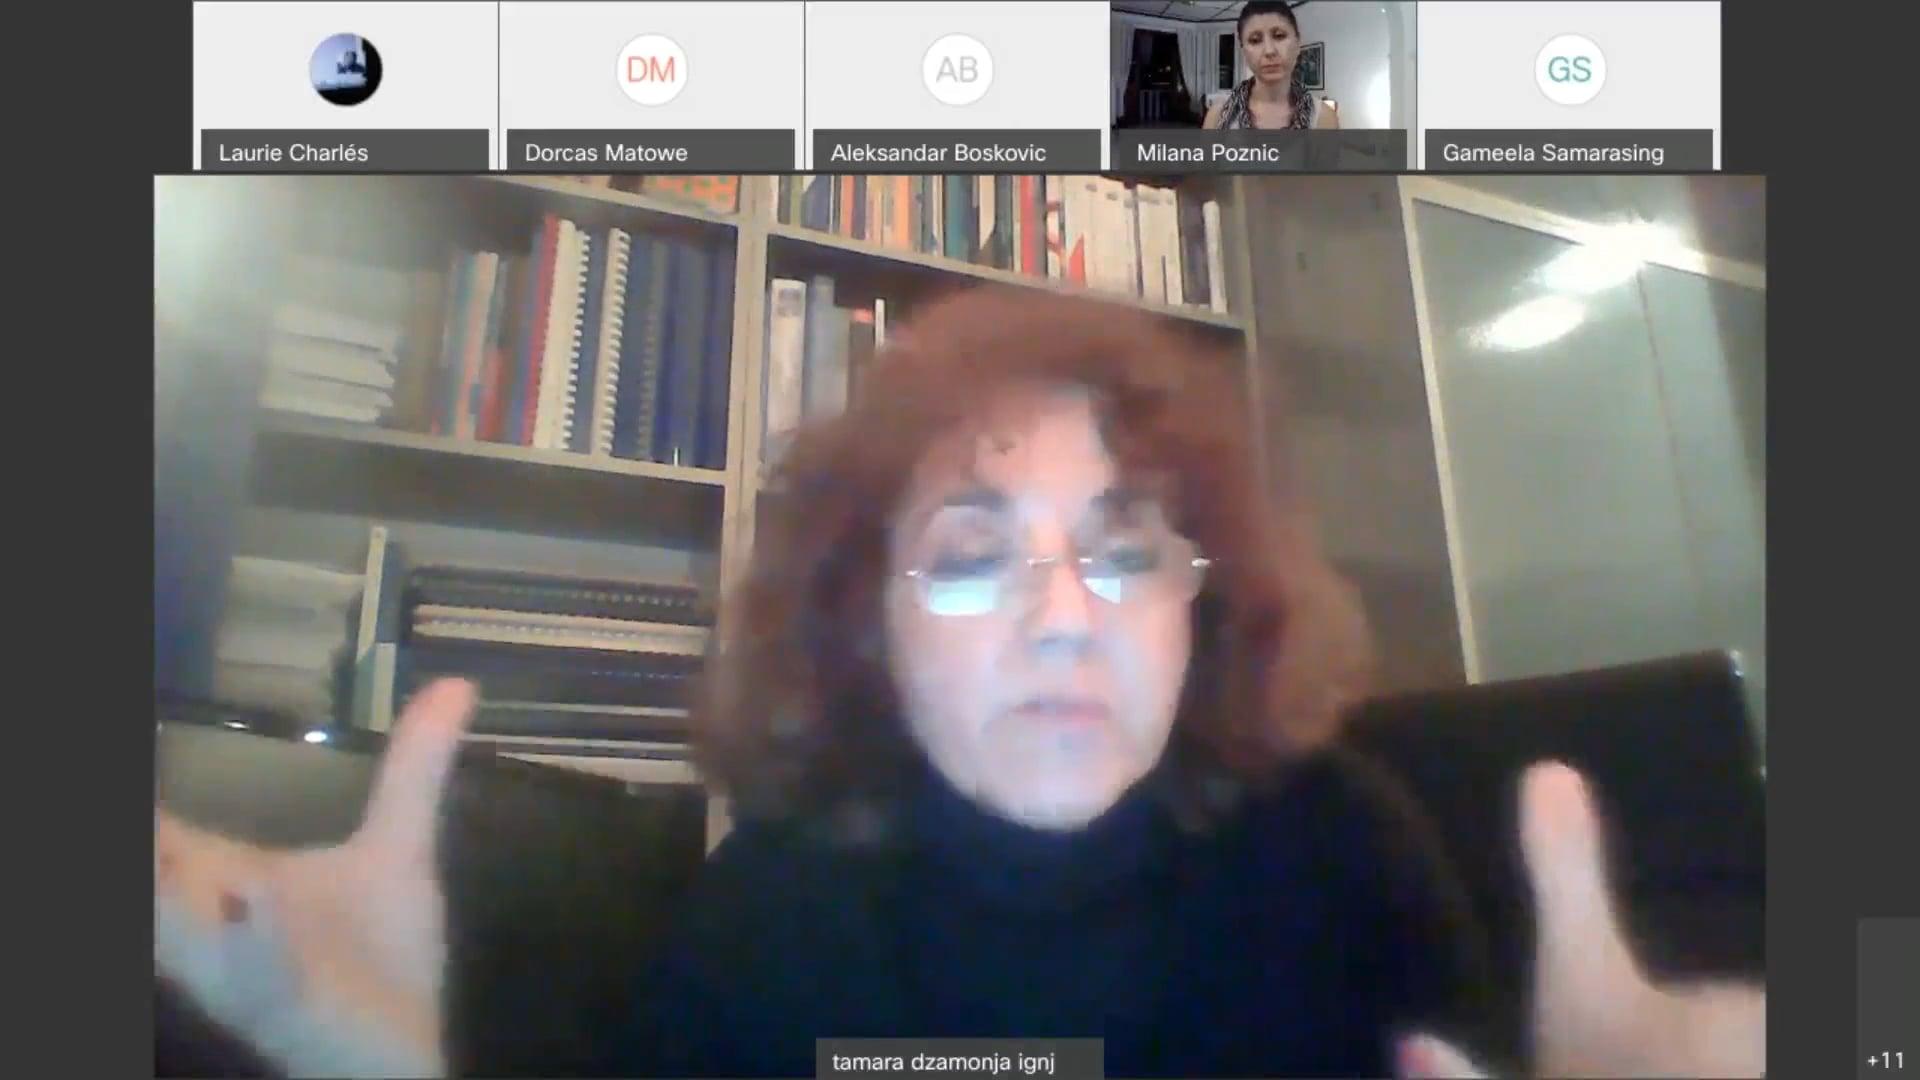 Panel XI of Global Family Systems & Psychosocial Resilience, January 17th 2021, with Dr. Tamara Džamonja Ignjatović